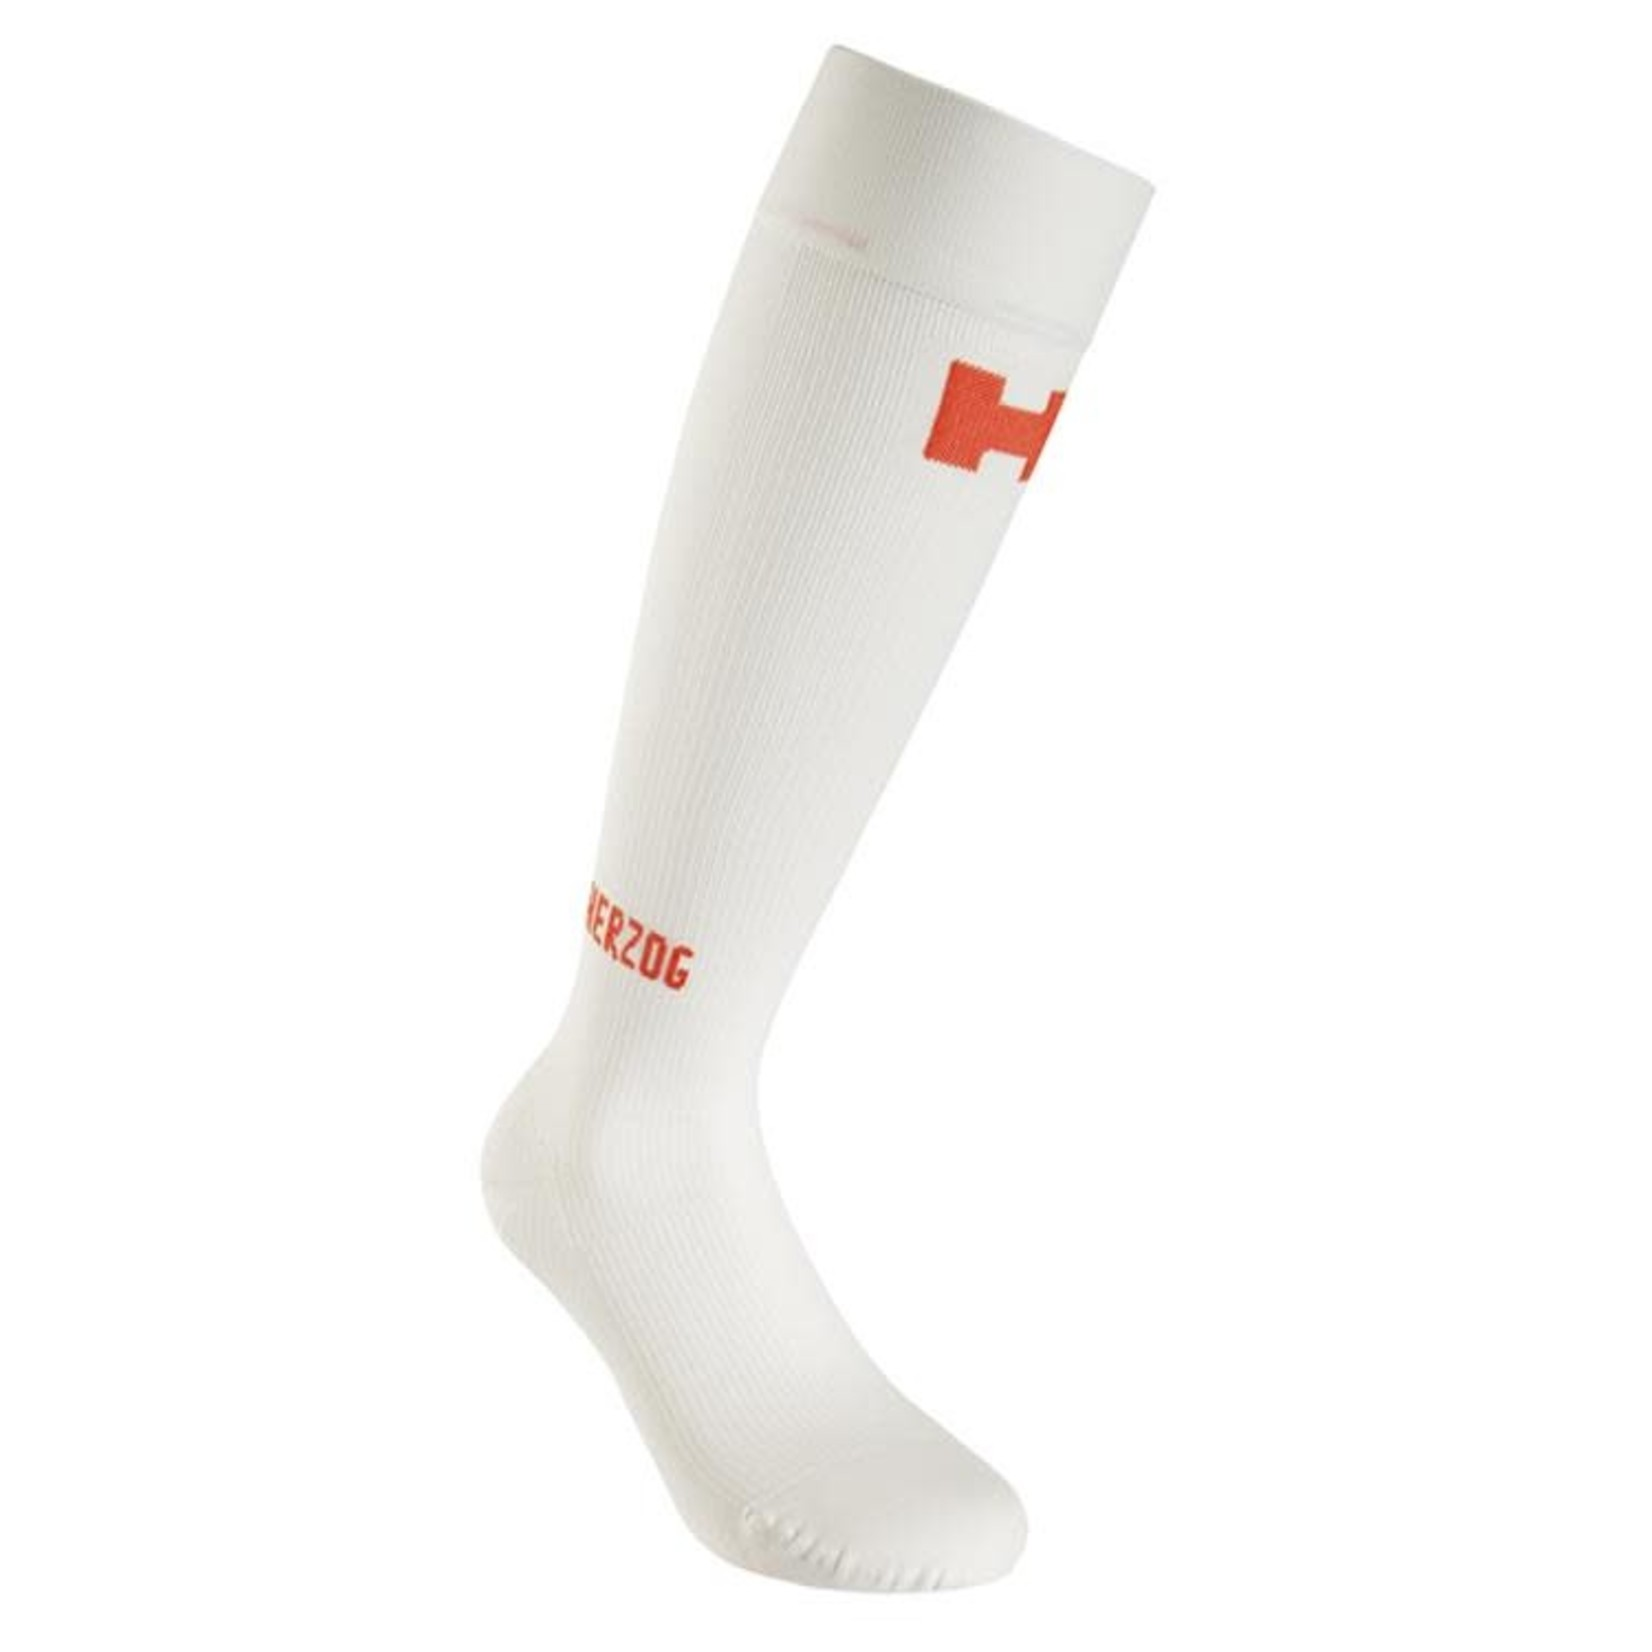 Herzog Pro Sock Long